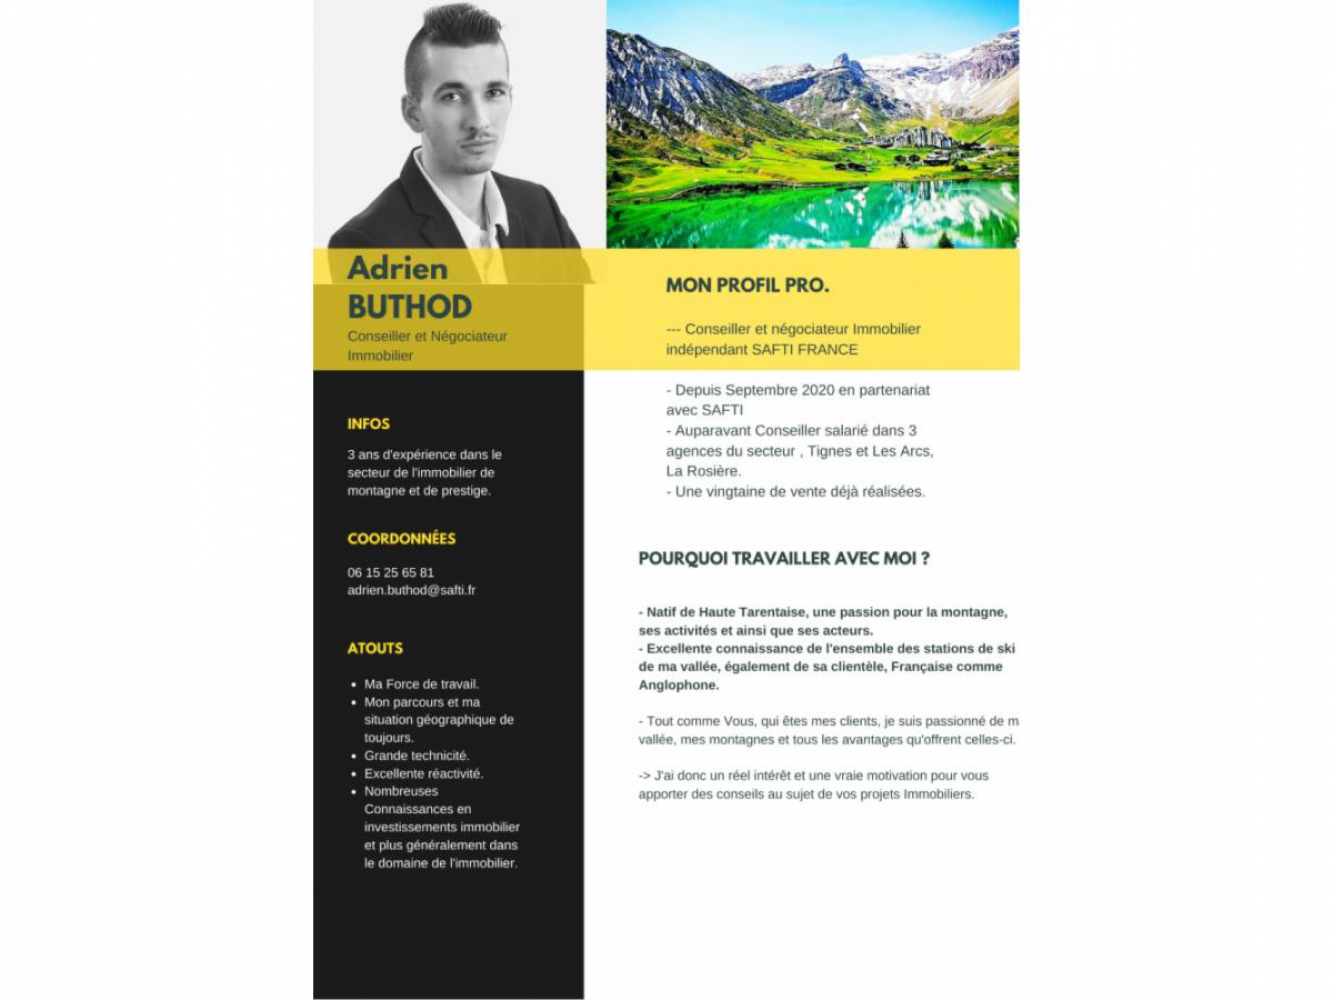 ADRIEN BUTHOD IMMOBILIER & CONSEILS